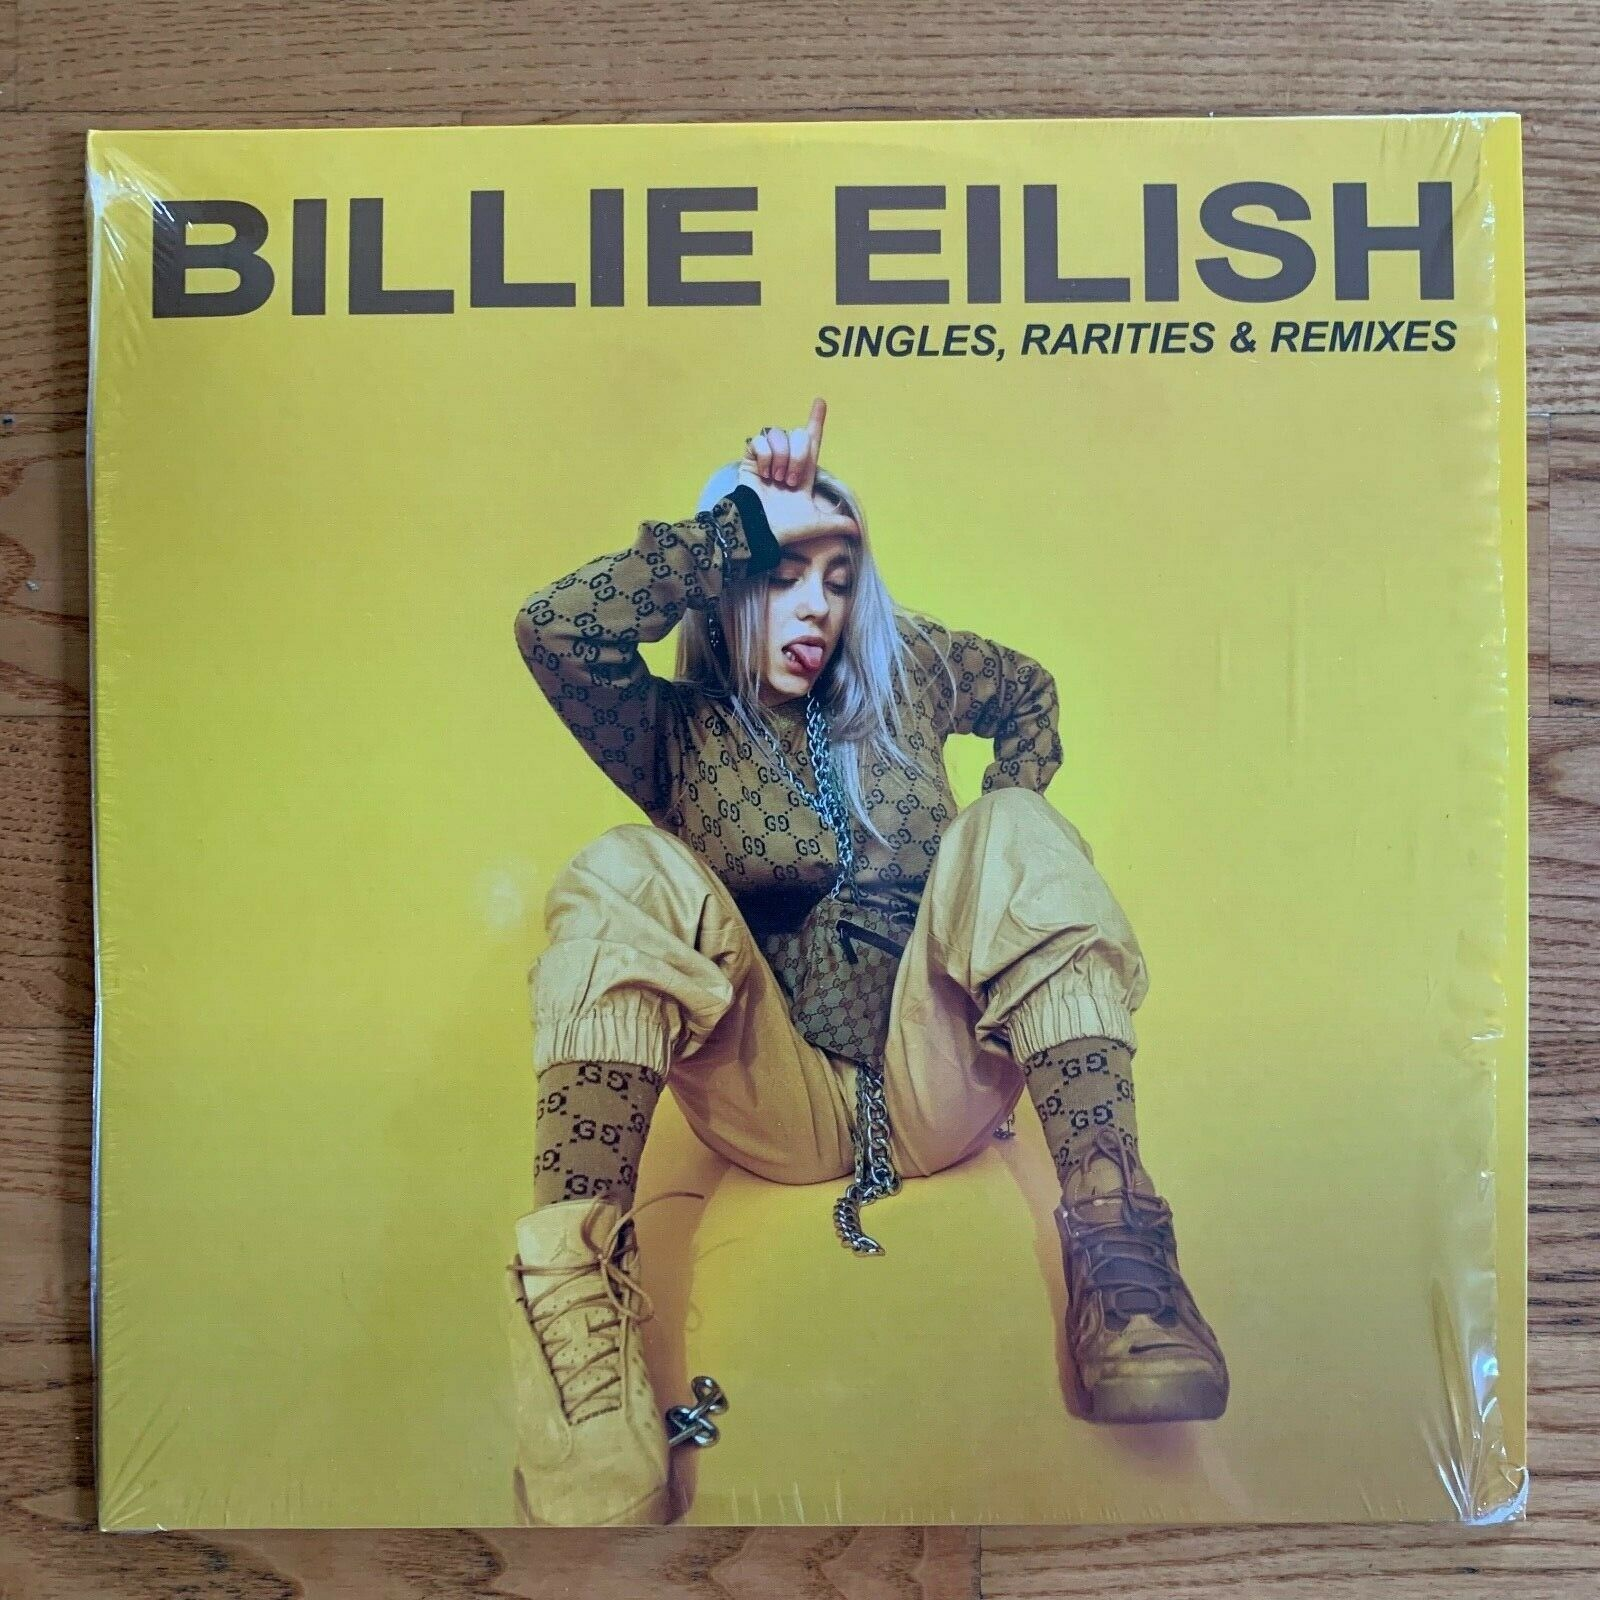 Billie Eilish - Singles, Rarities & Remixes [1LP] Vinyl 2019 Yellow Record X/500